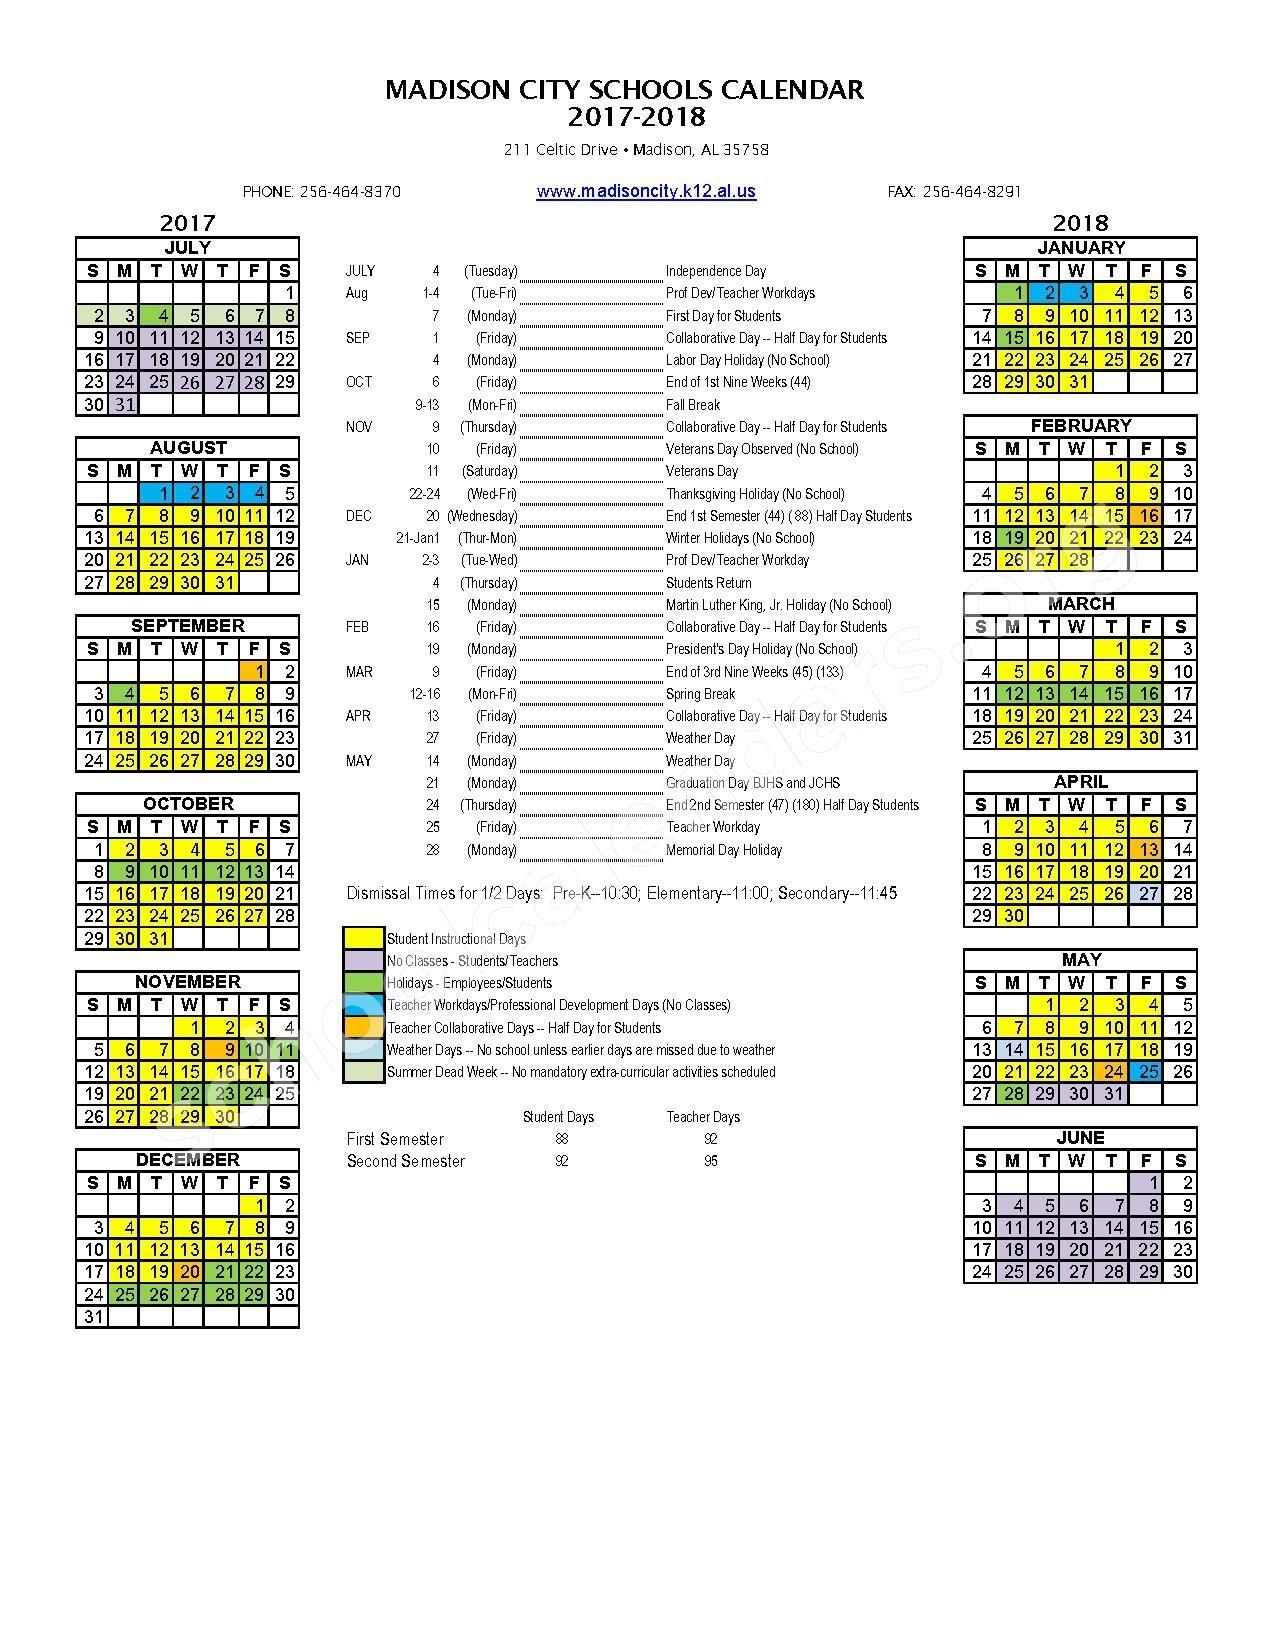 Madison City Schools Calendars – Madison, Al_Madison 1 School Calendar